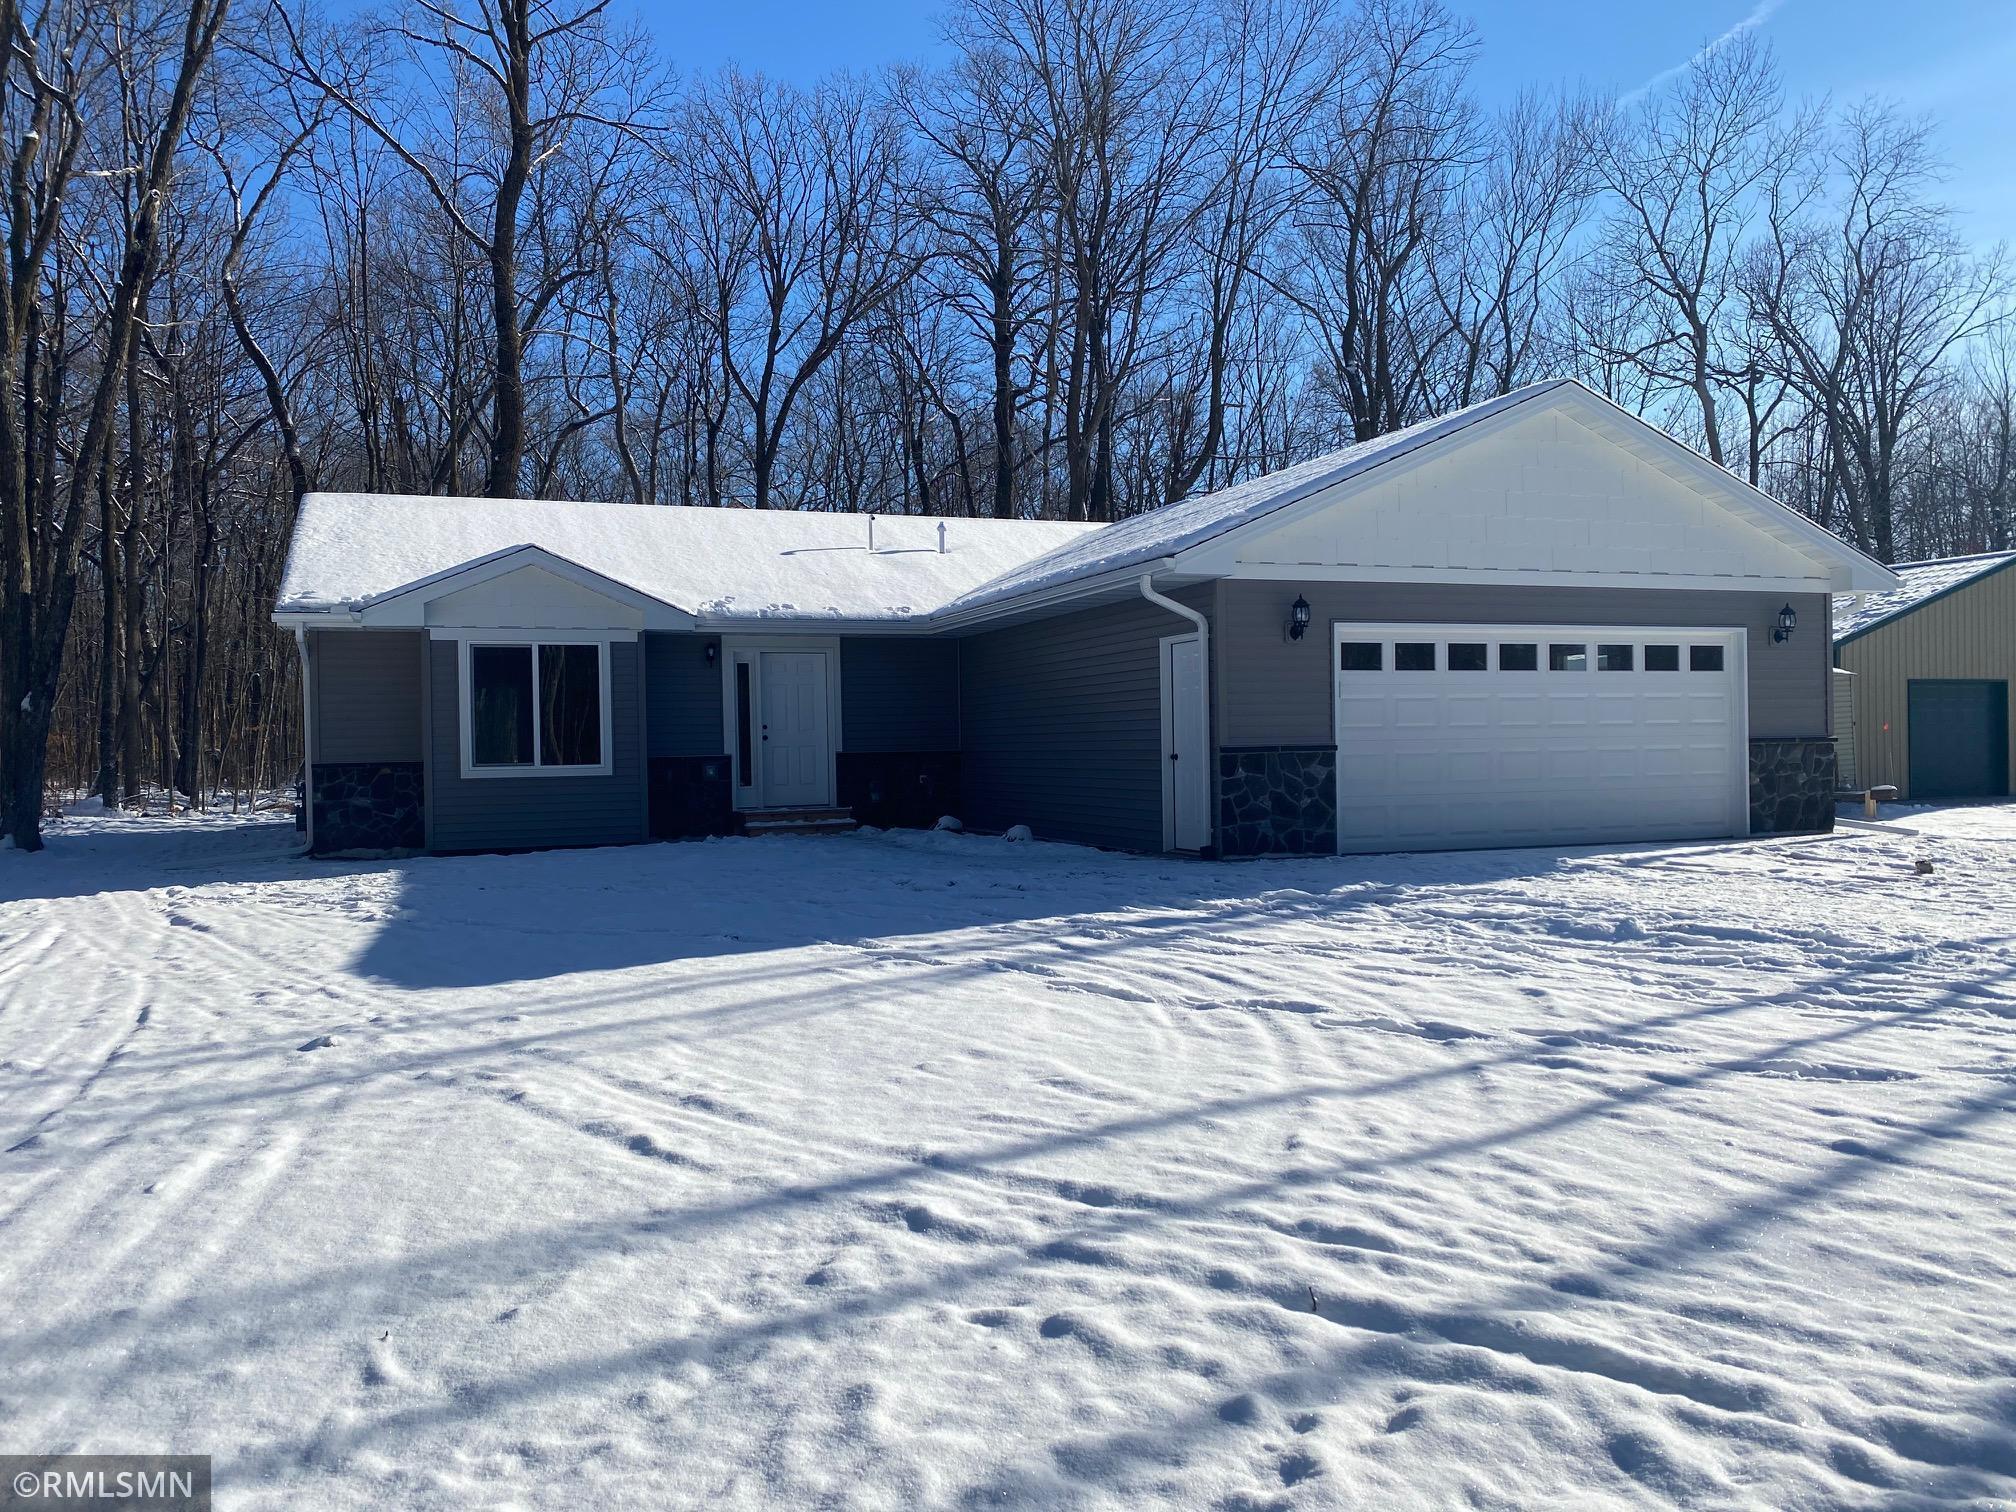 13878 Cross Lake Rd Property Photo - Pine City Twp, MN real estate listing